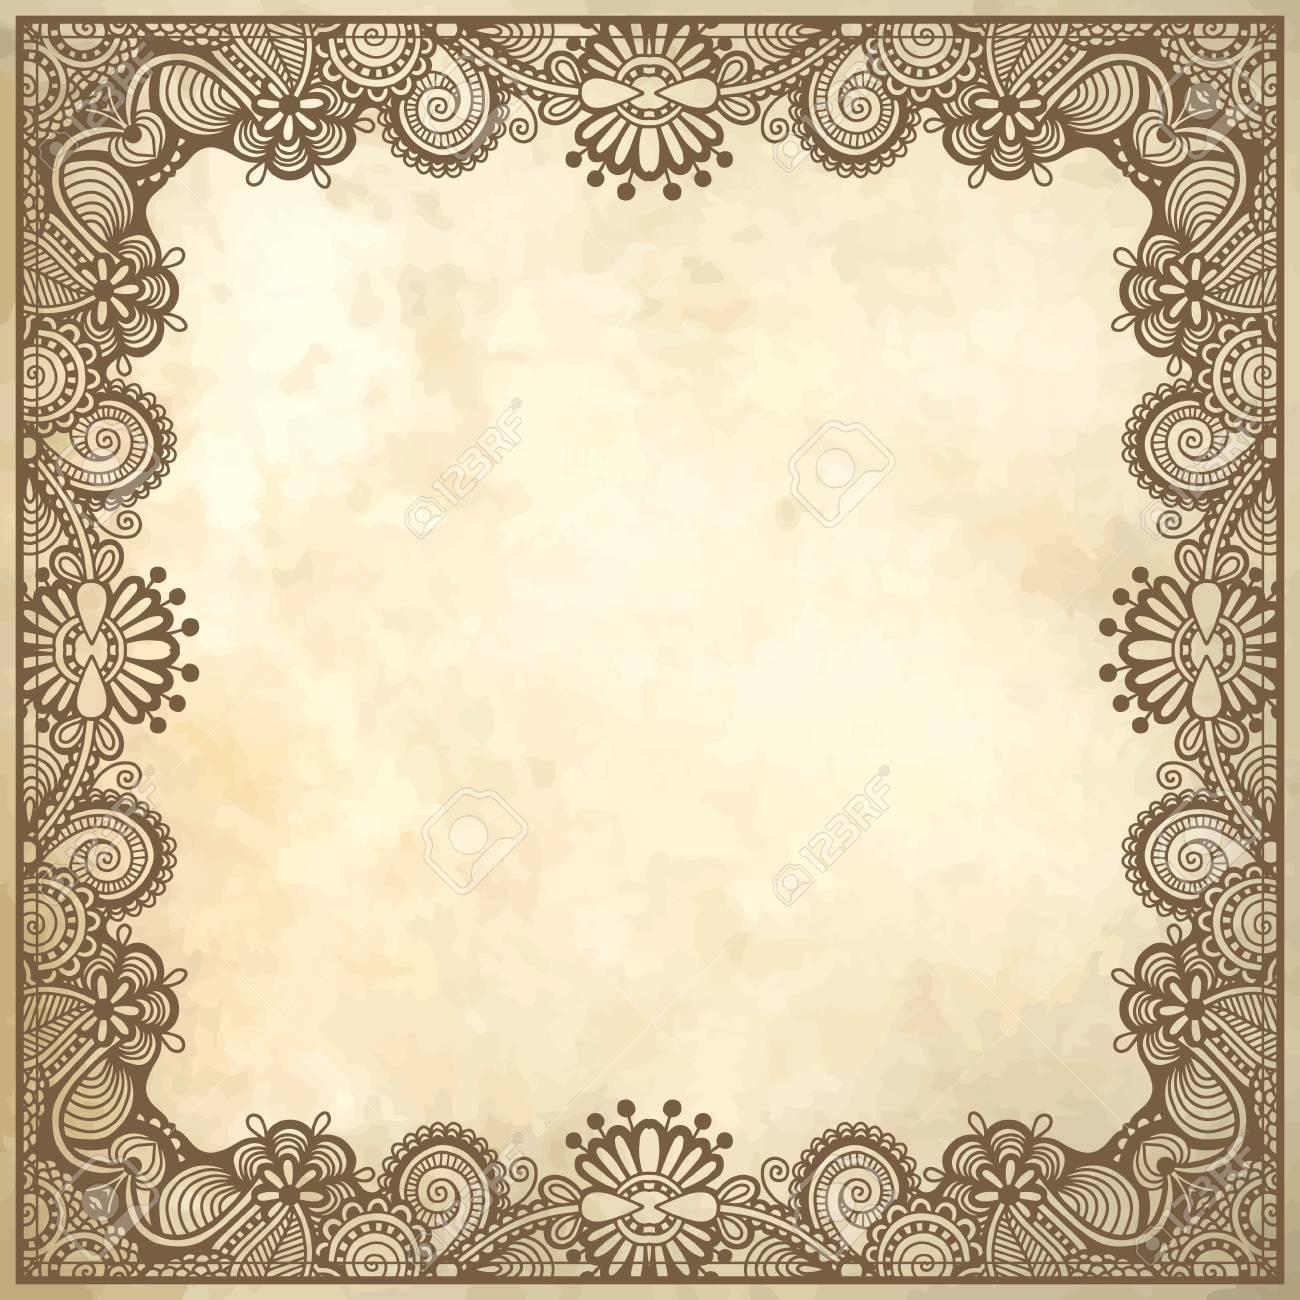 flower frame design on grunge background Stock Vector - 17418222